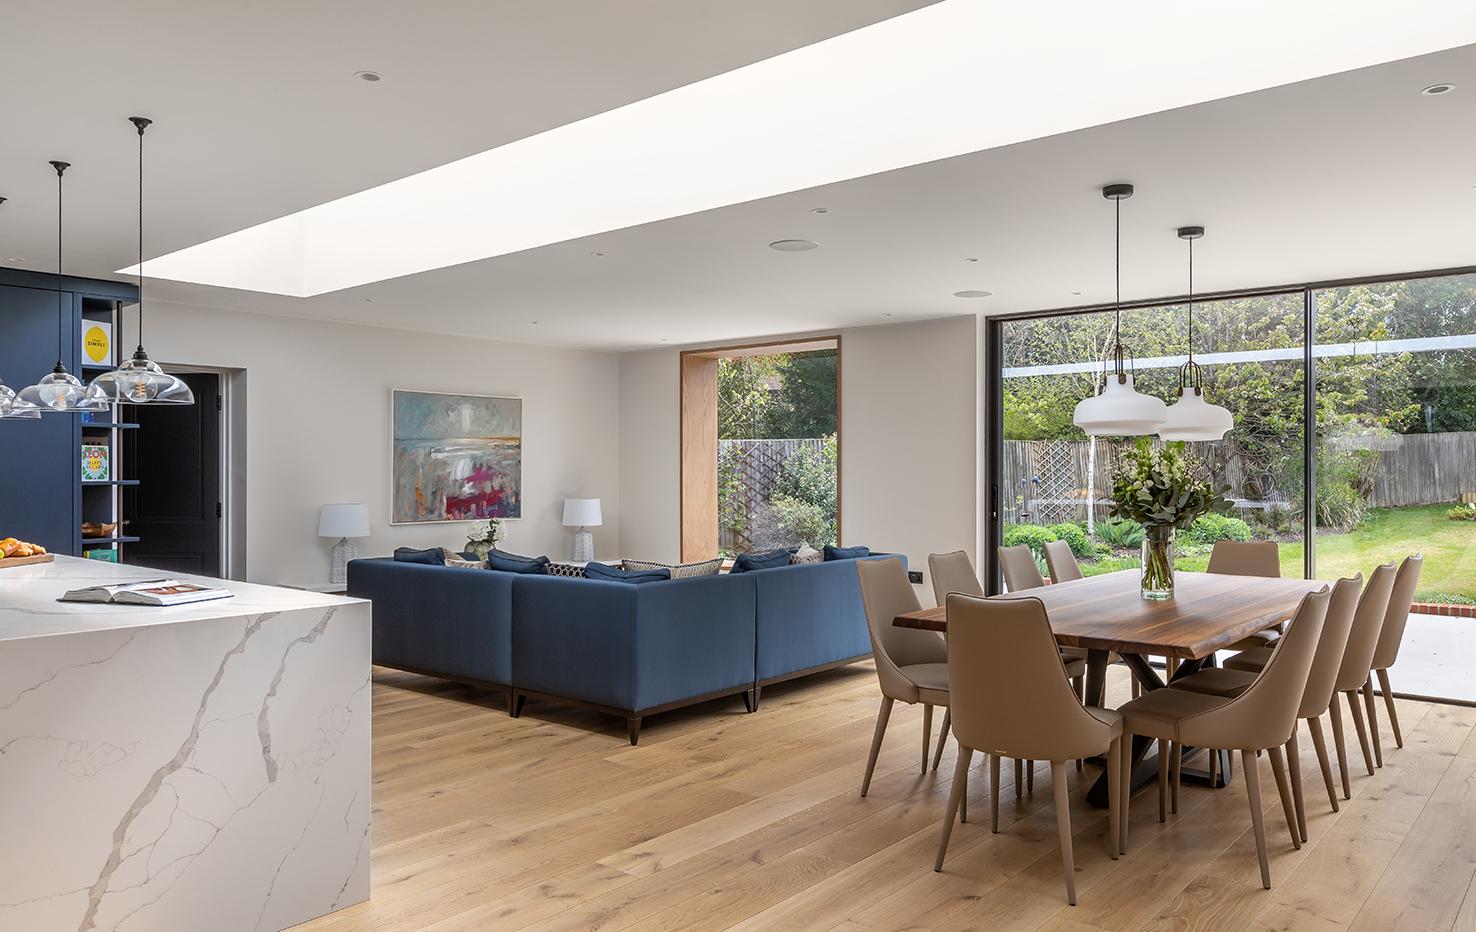 Chilterns-Hill-SL320-Rooflight-Fixed-Window_1